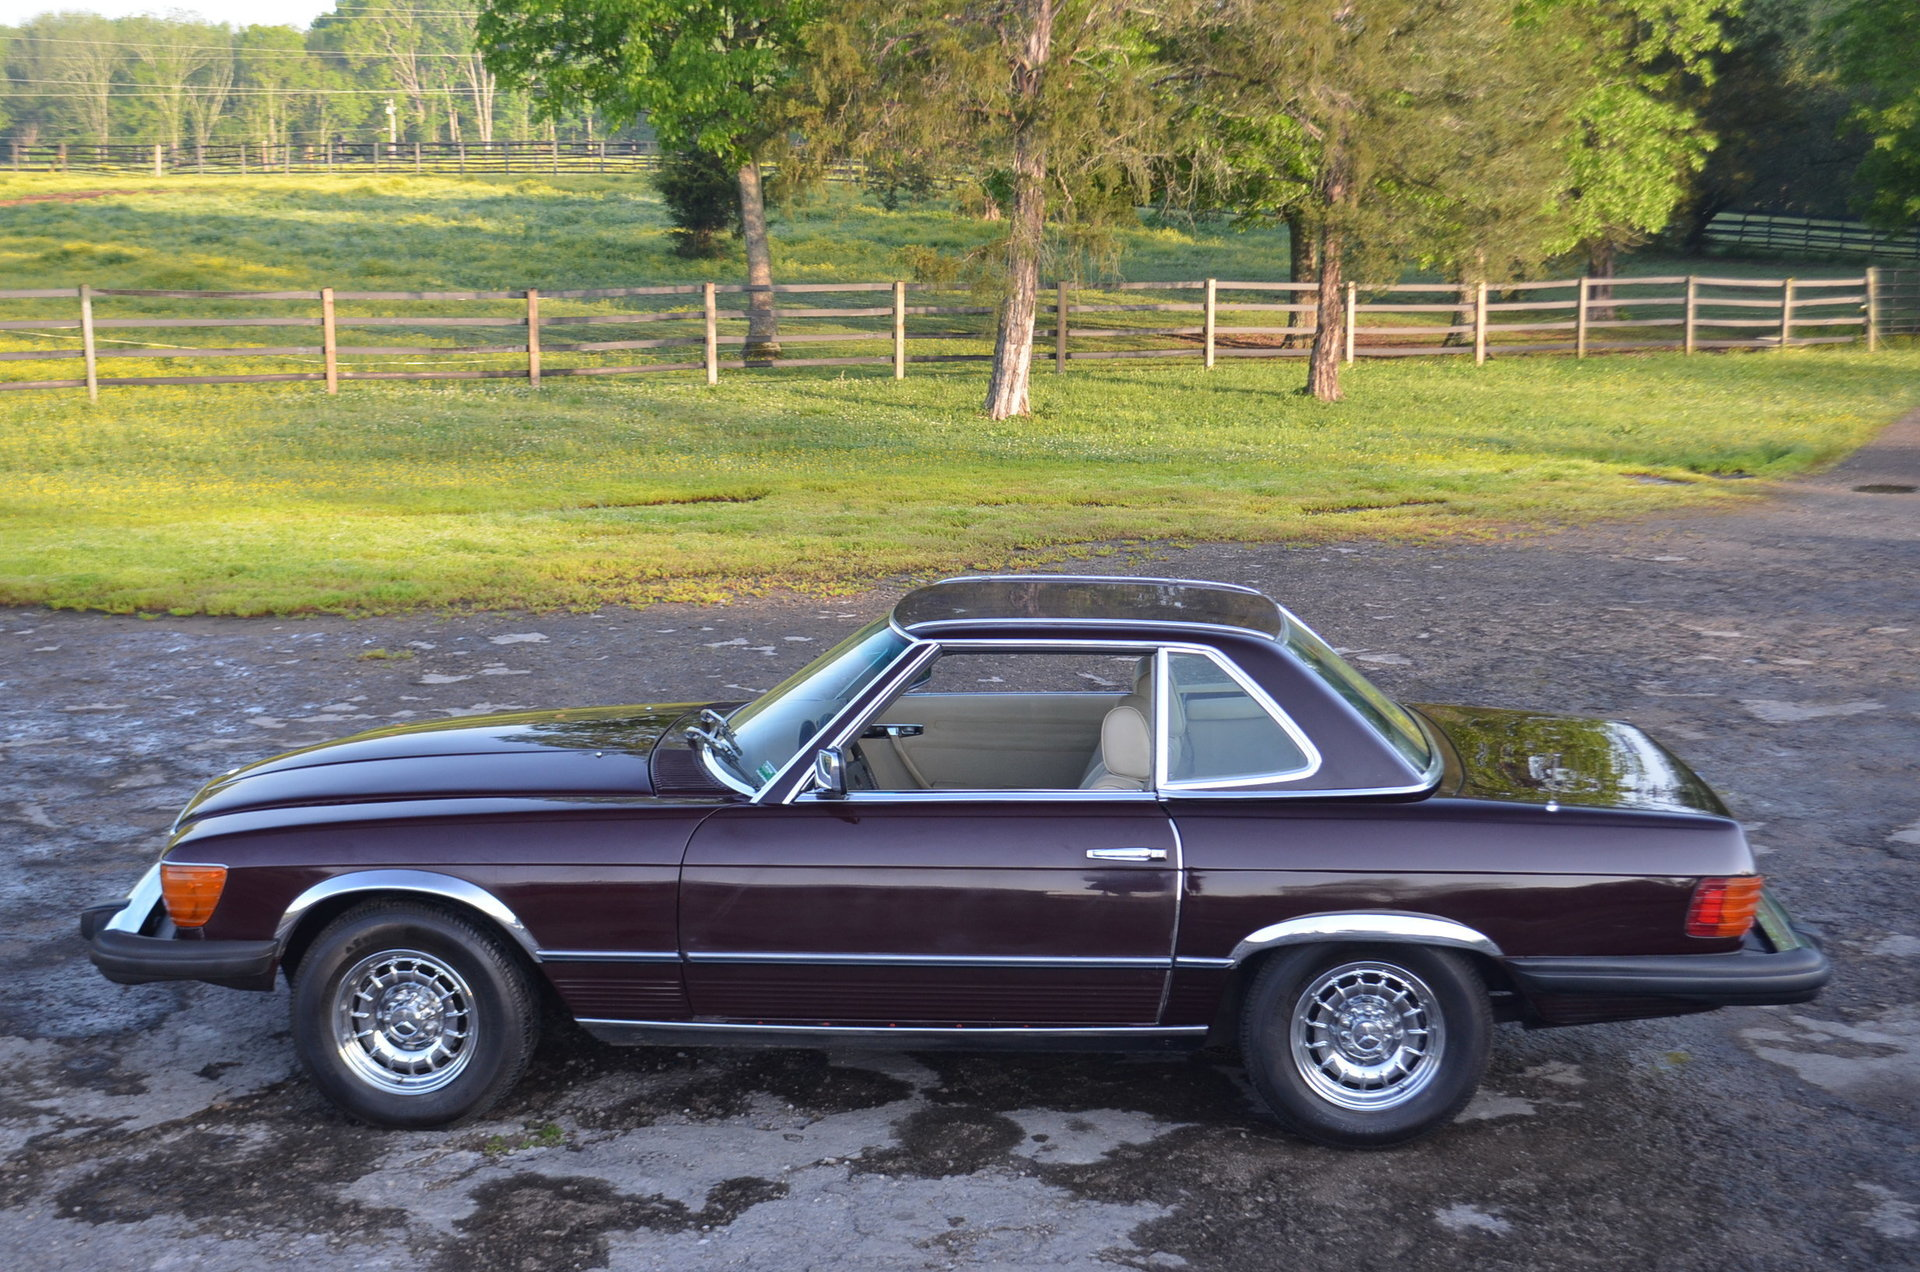 1978 mercedes benz 450sl for sale 88976 mcg for Mercedes garage 93